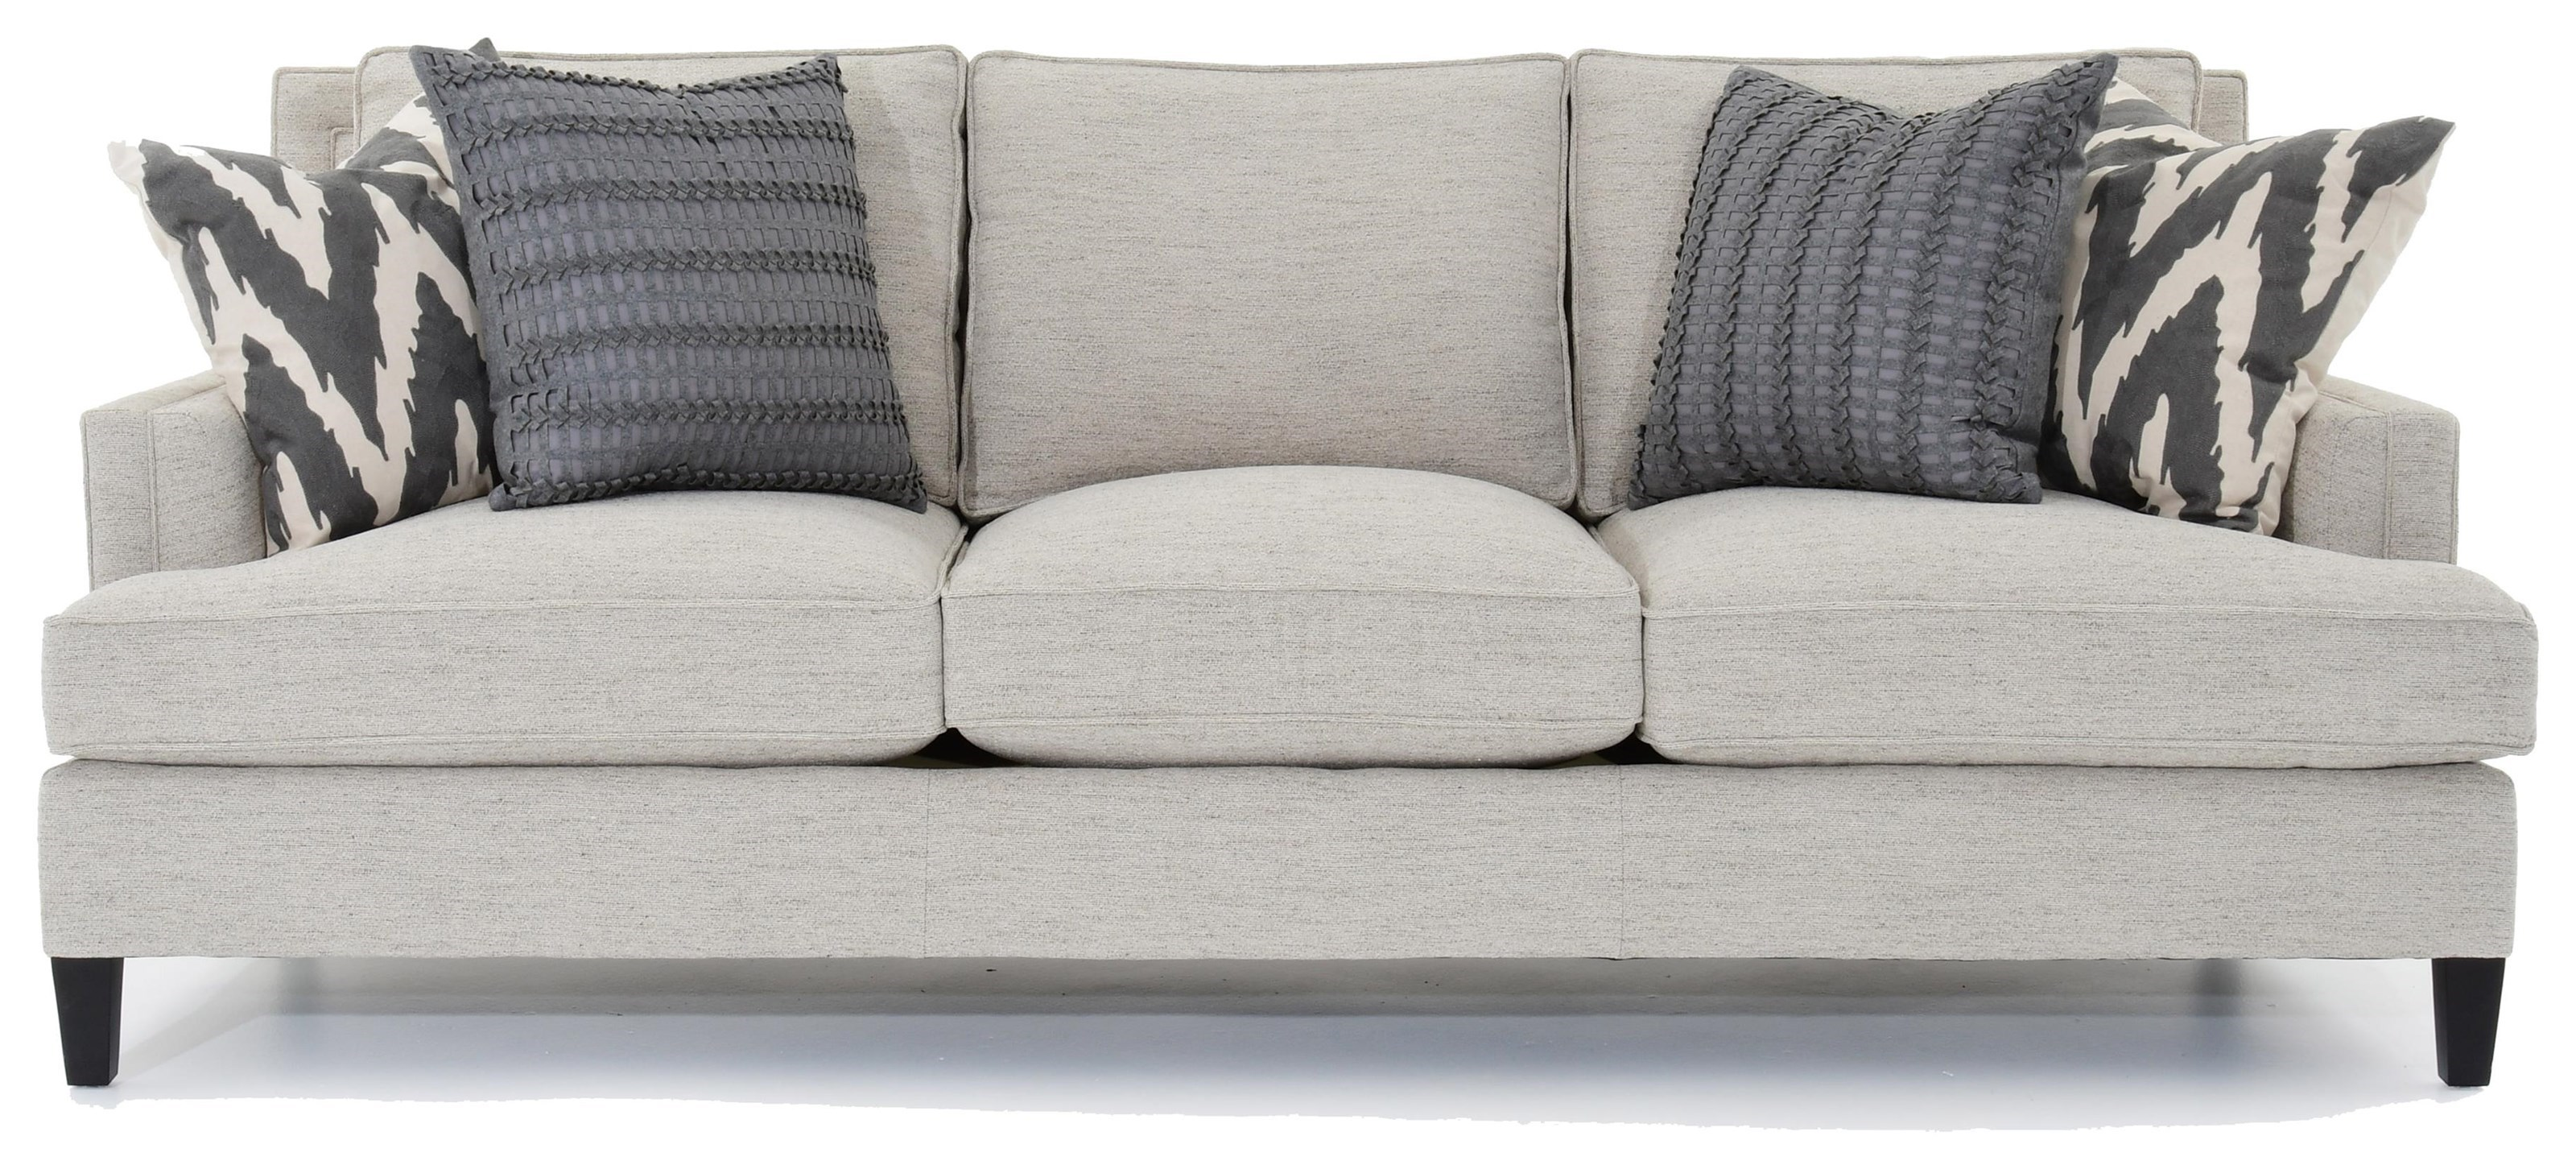 Bernhardt AddisonCasual Styled Sofa ...